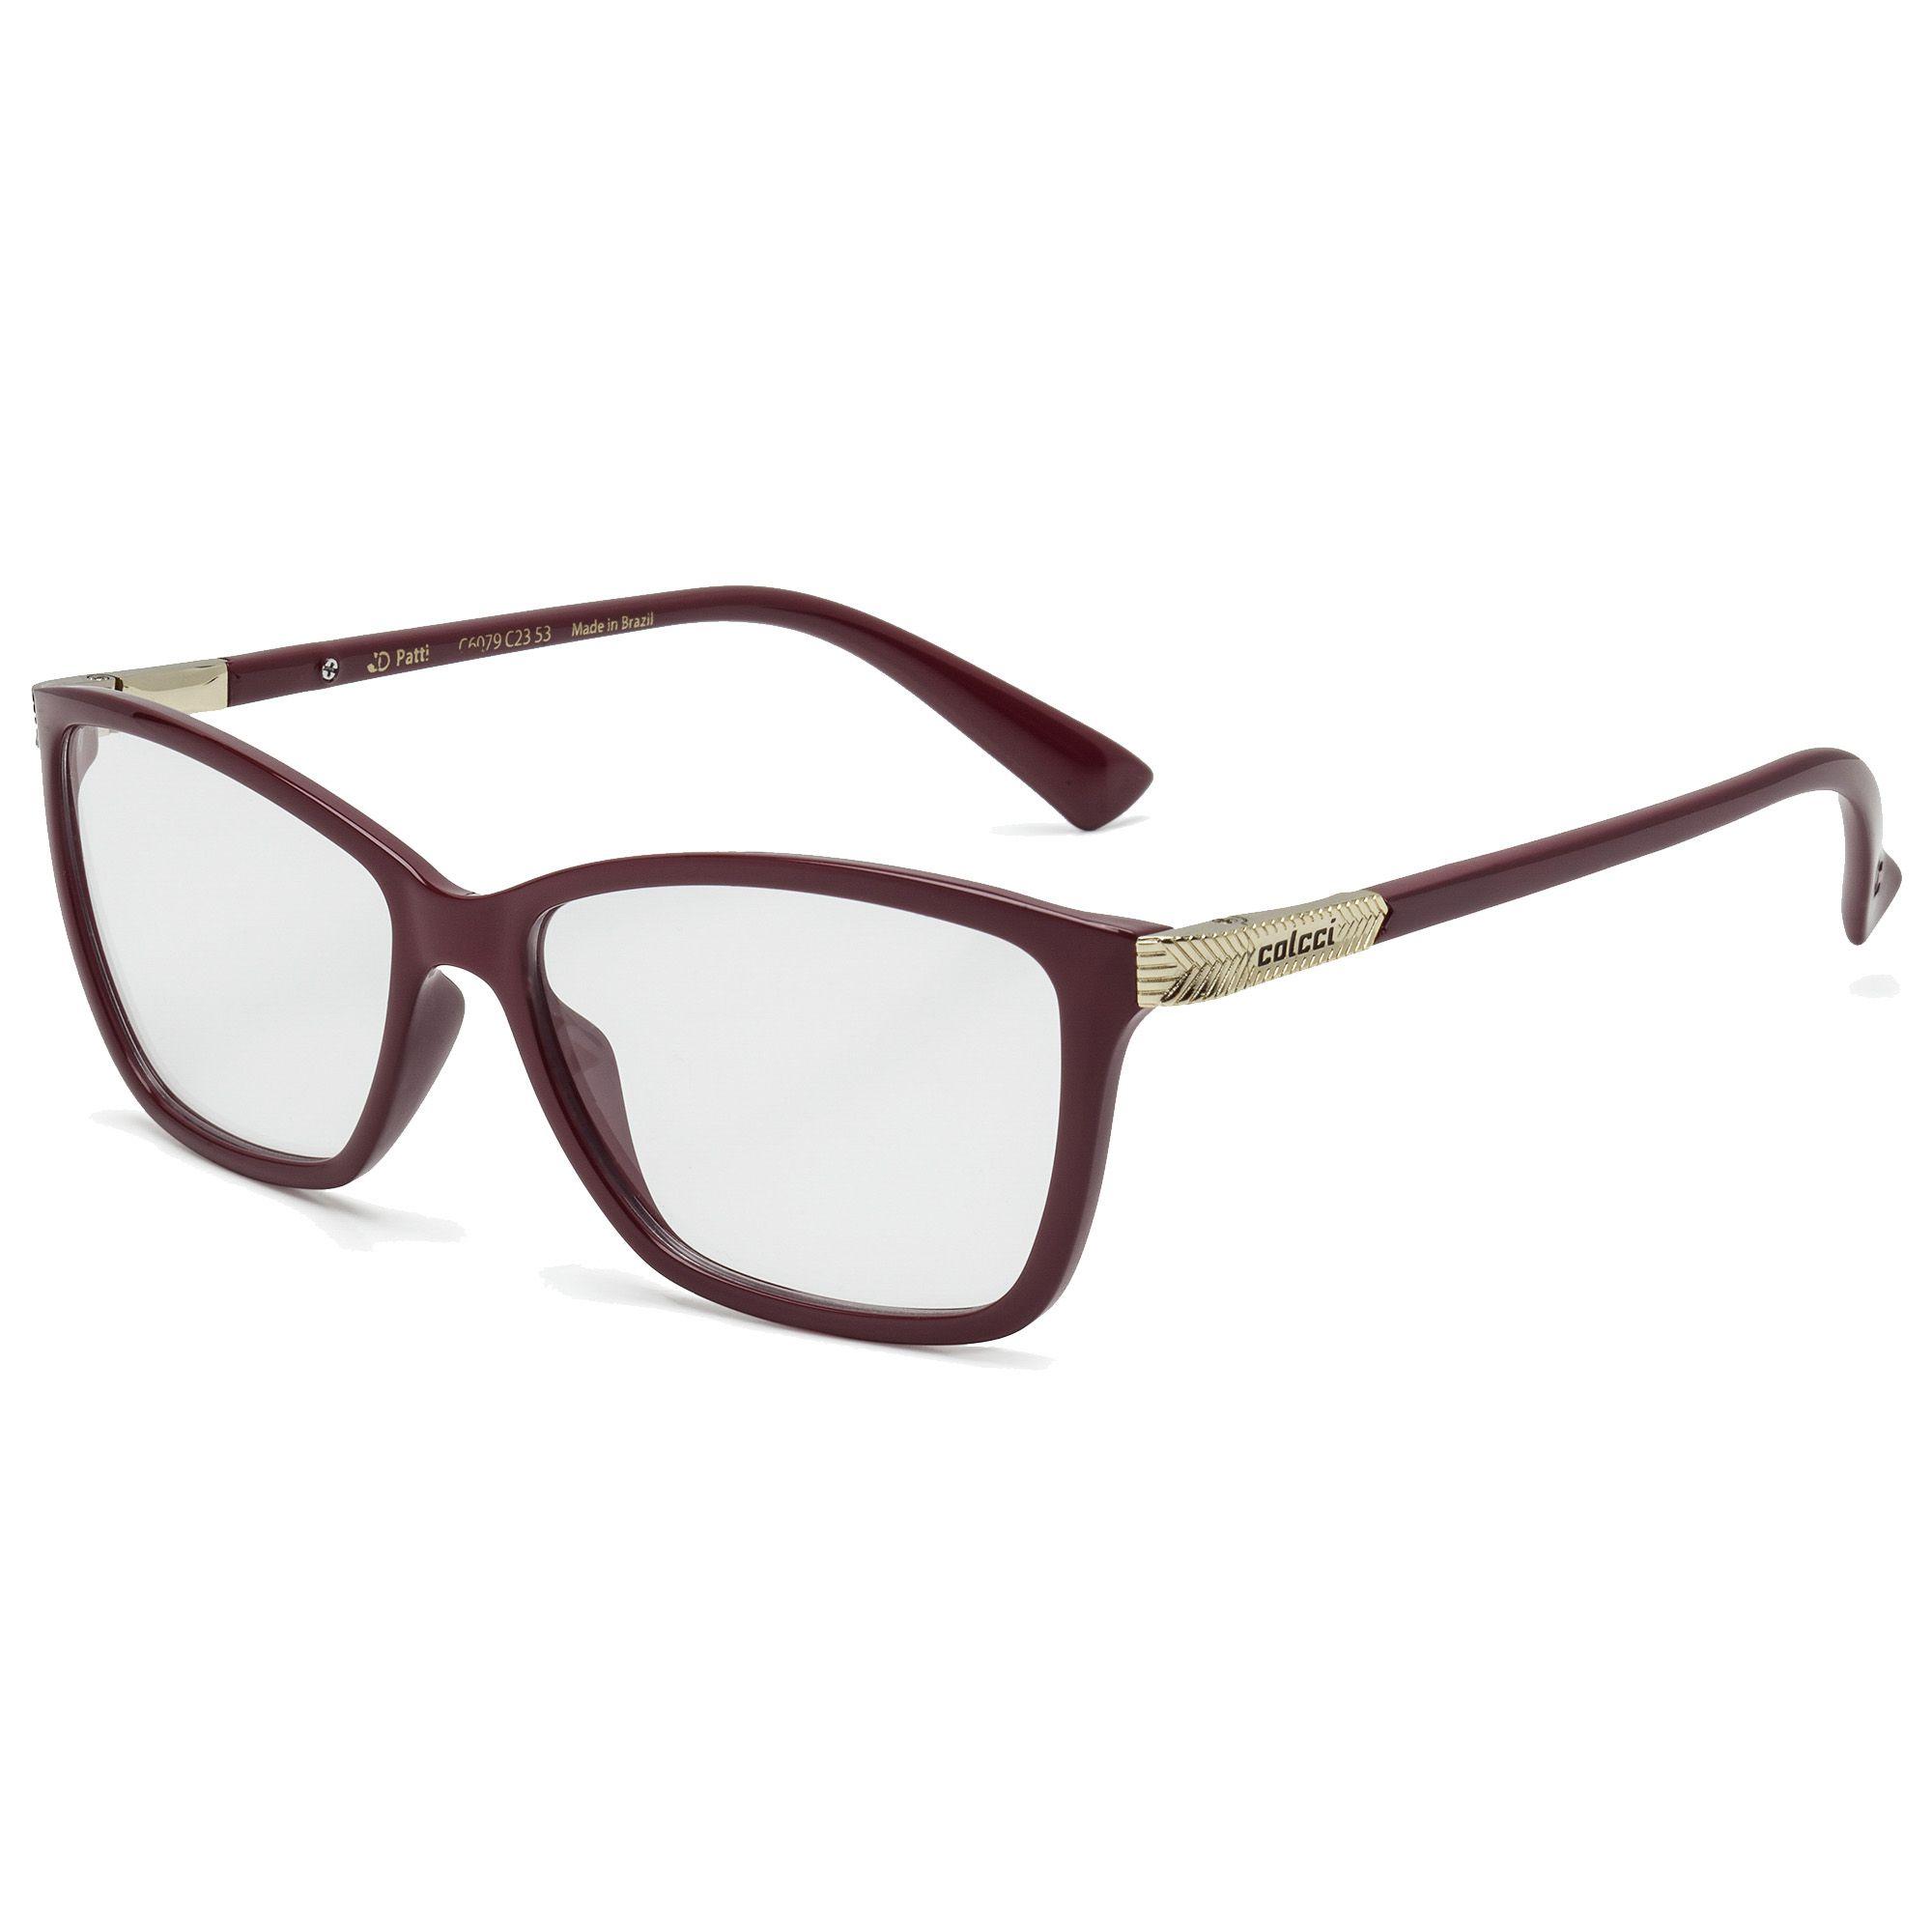 Óculos de Grau Feminino Colcci Patti C6079C2353